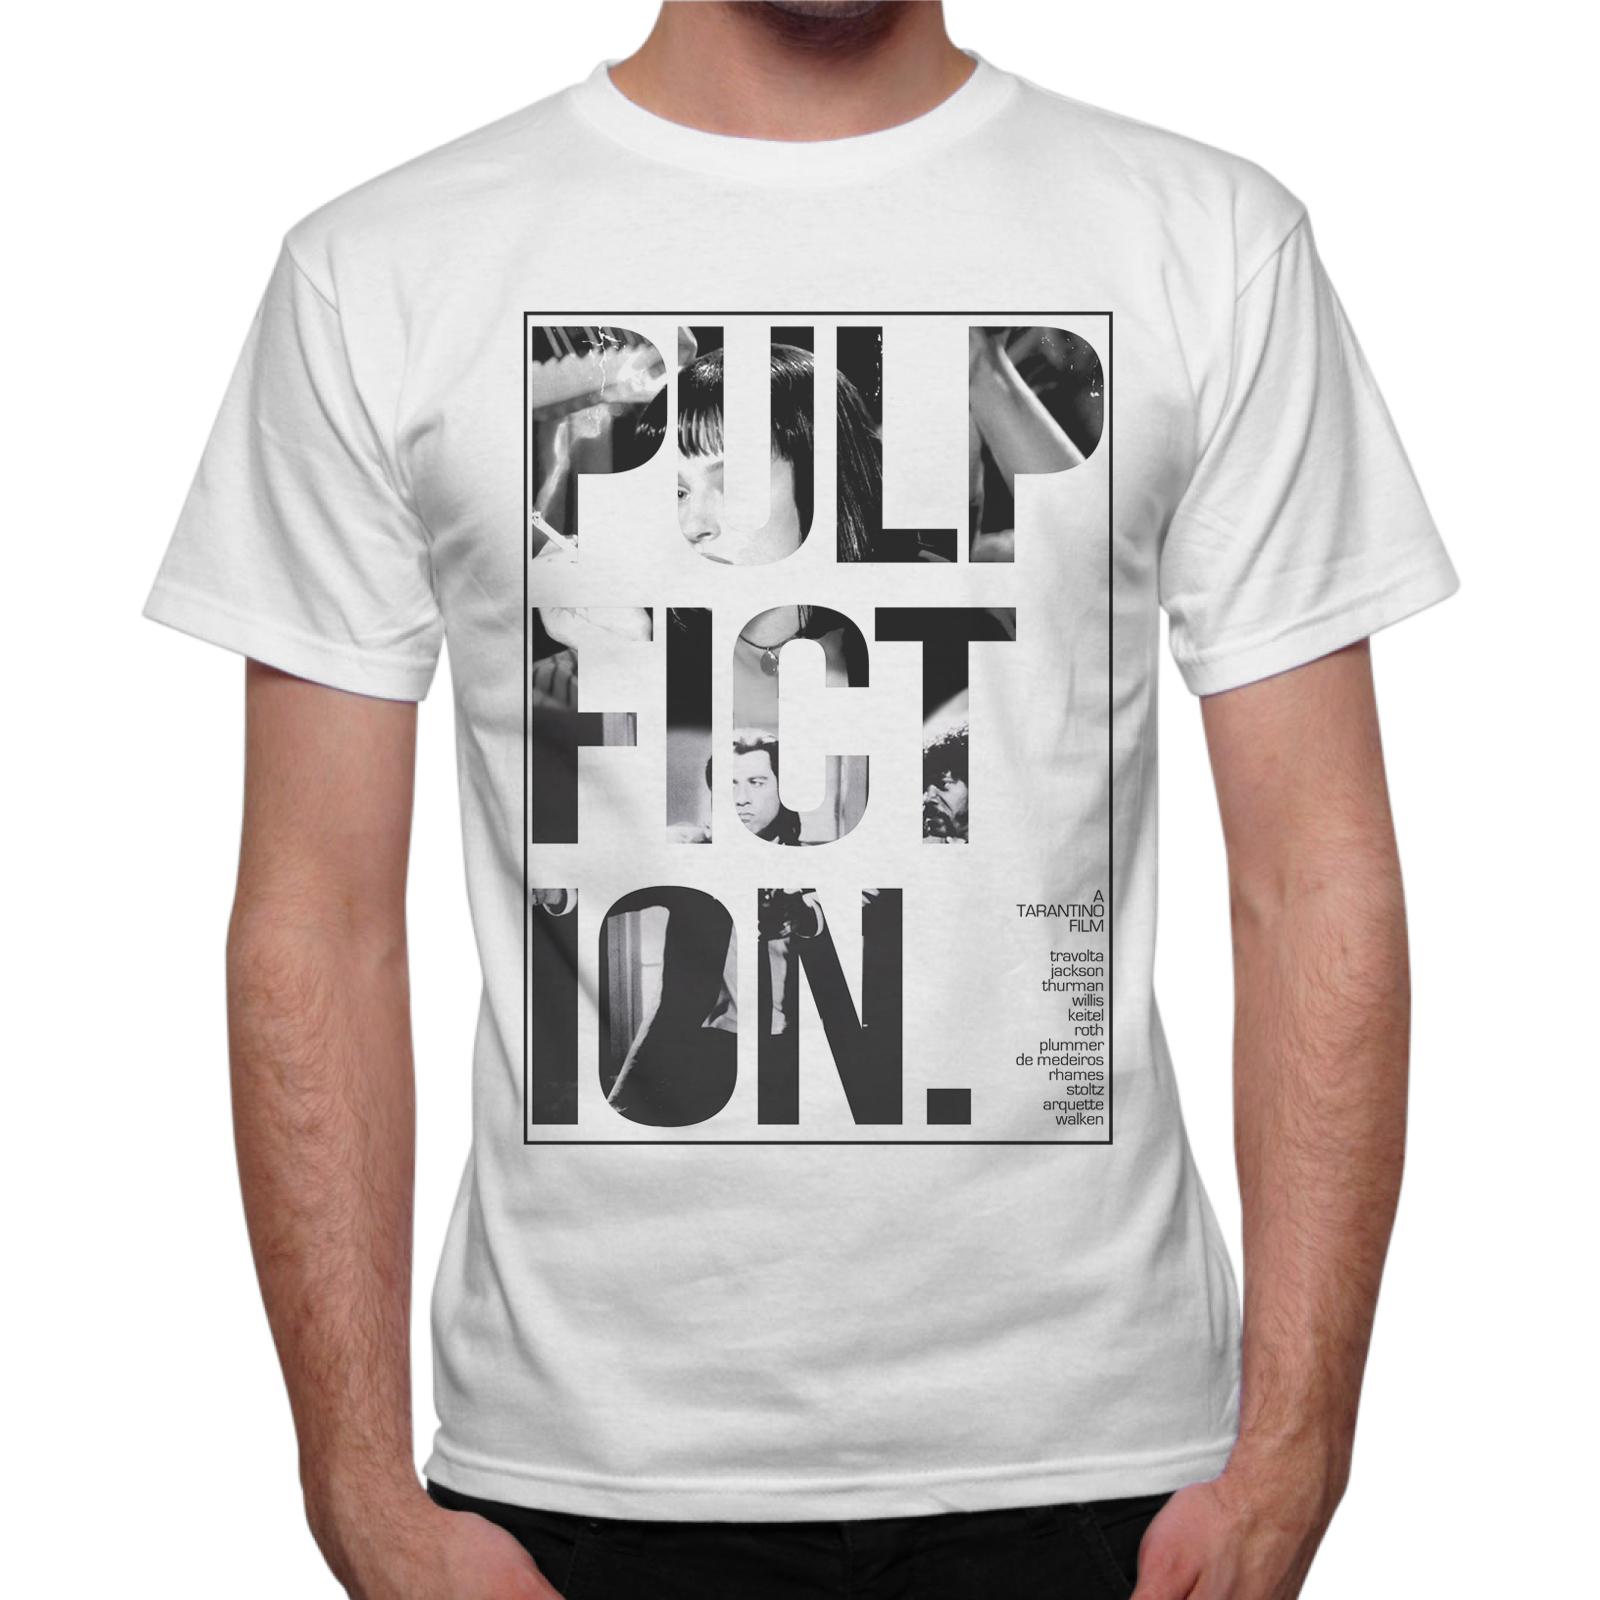 T-Shirt Uomo PULP FICTION 1